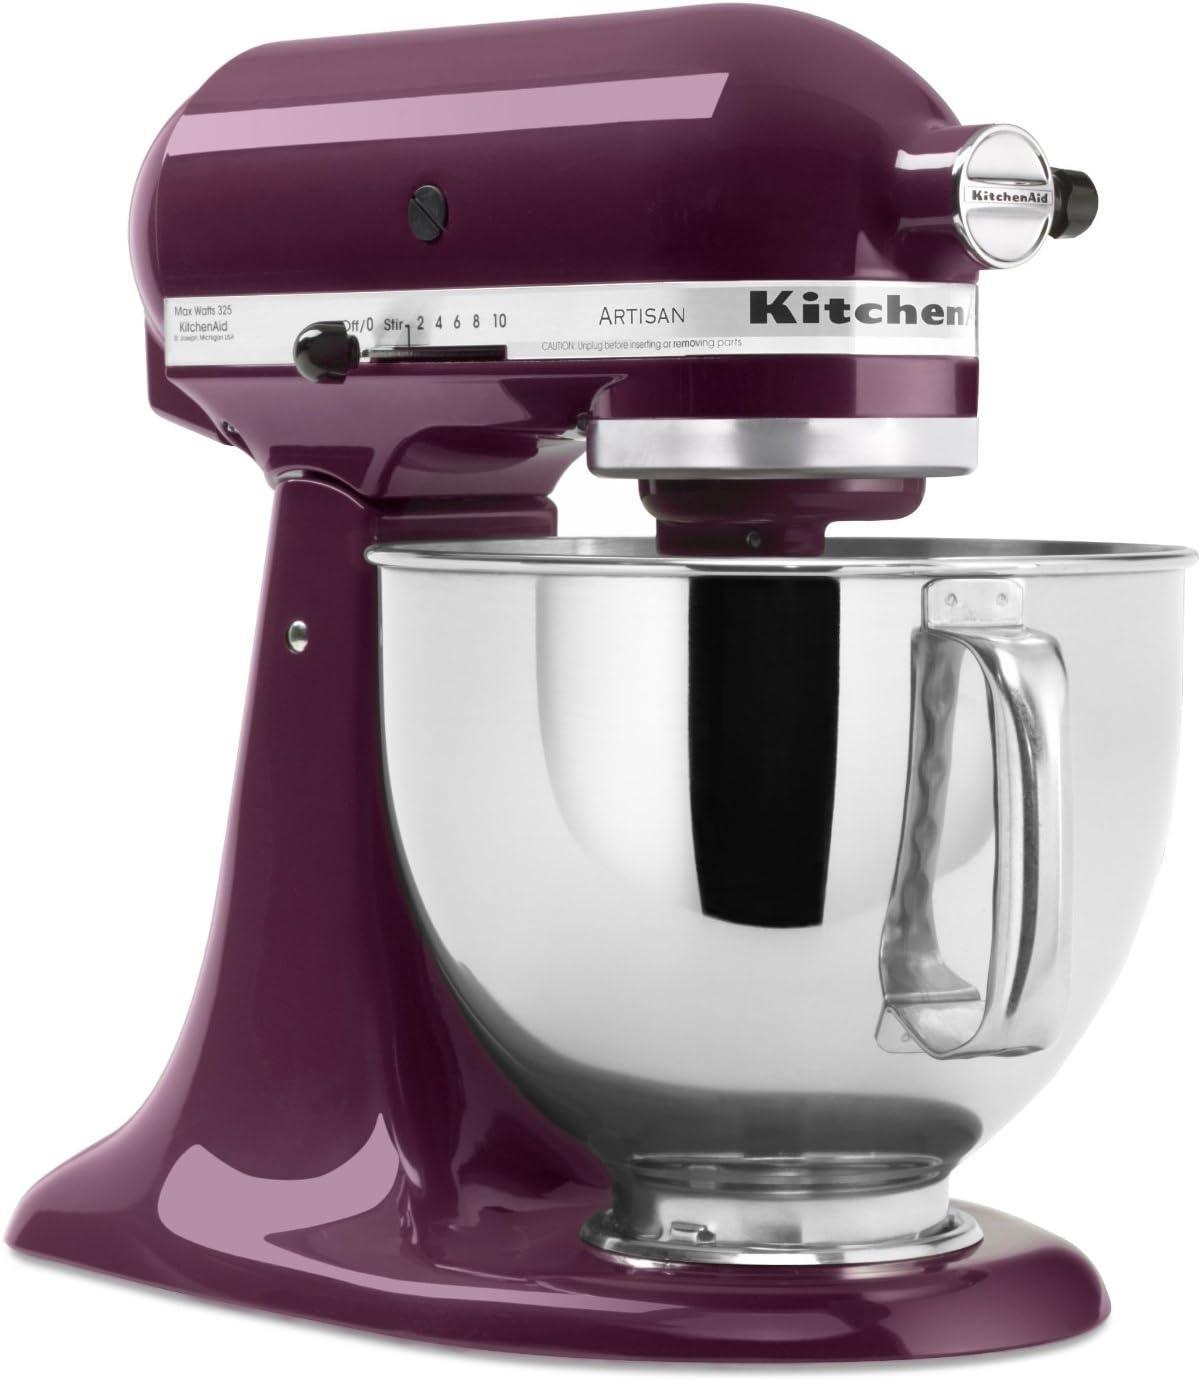 KitchenAid 5413184104160 - Robot de cocina, motor de 300 vatios ...